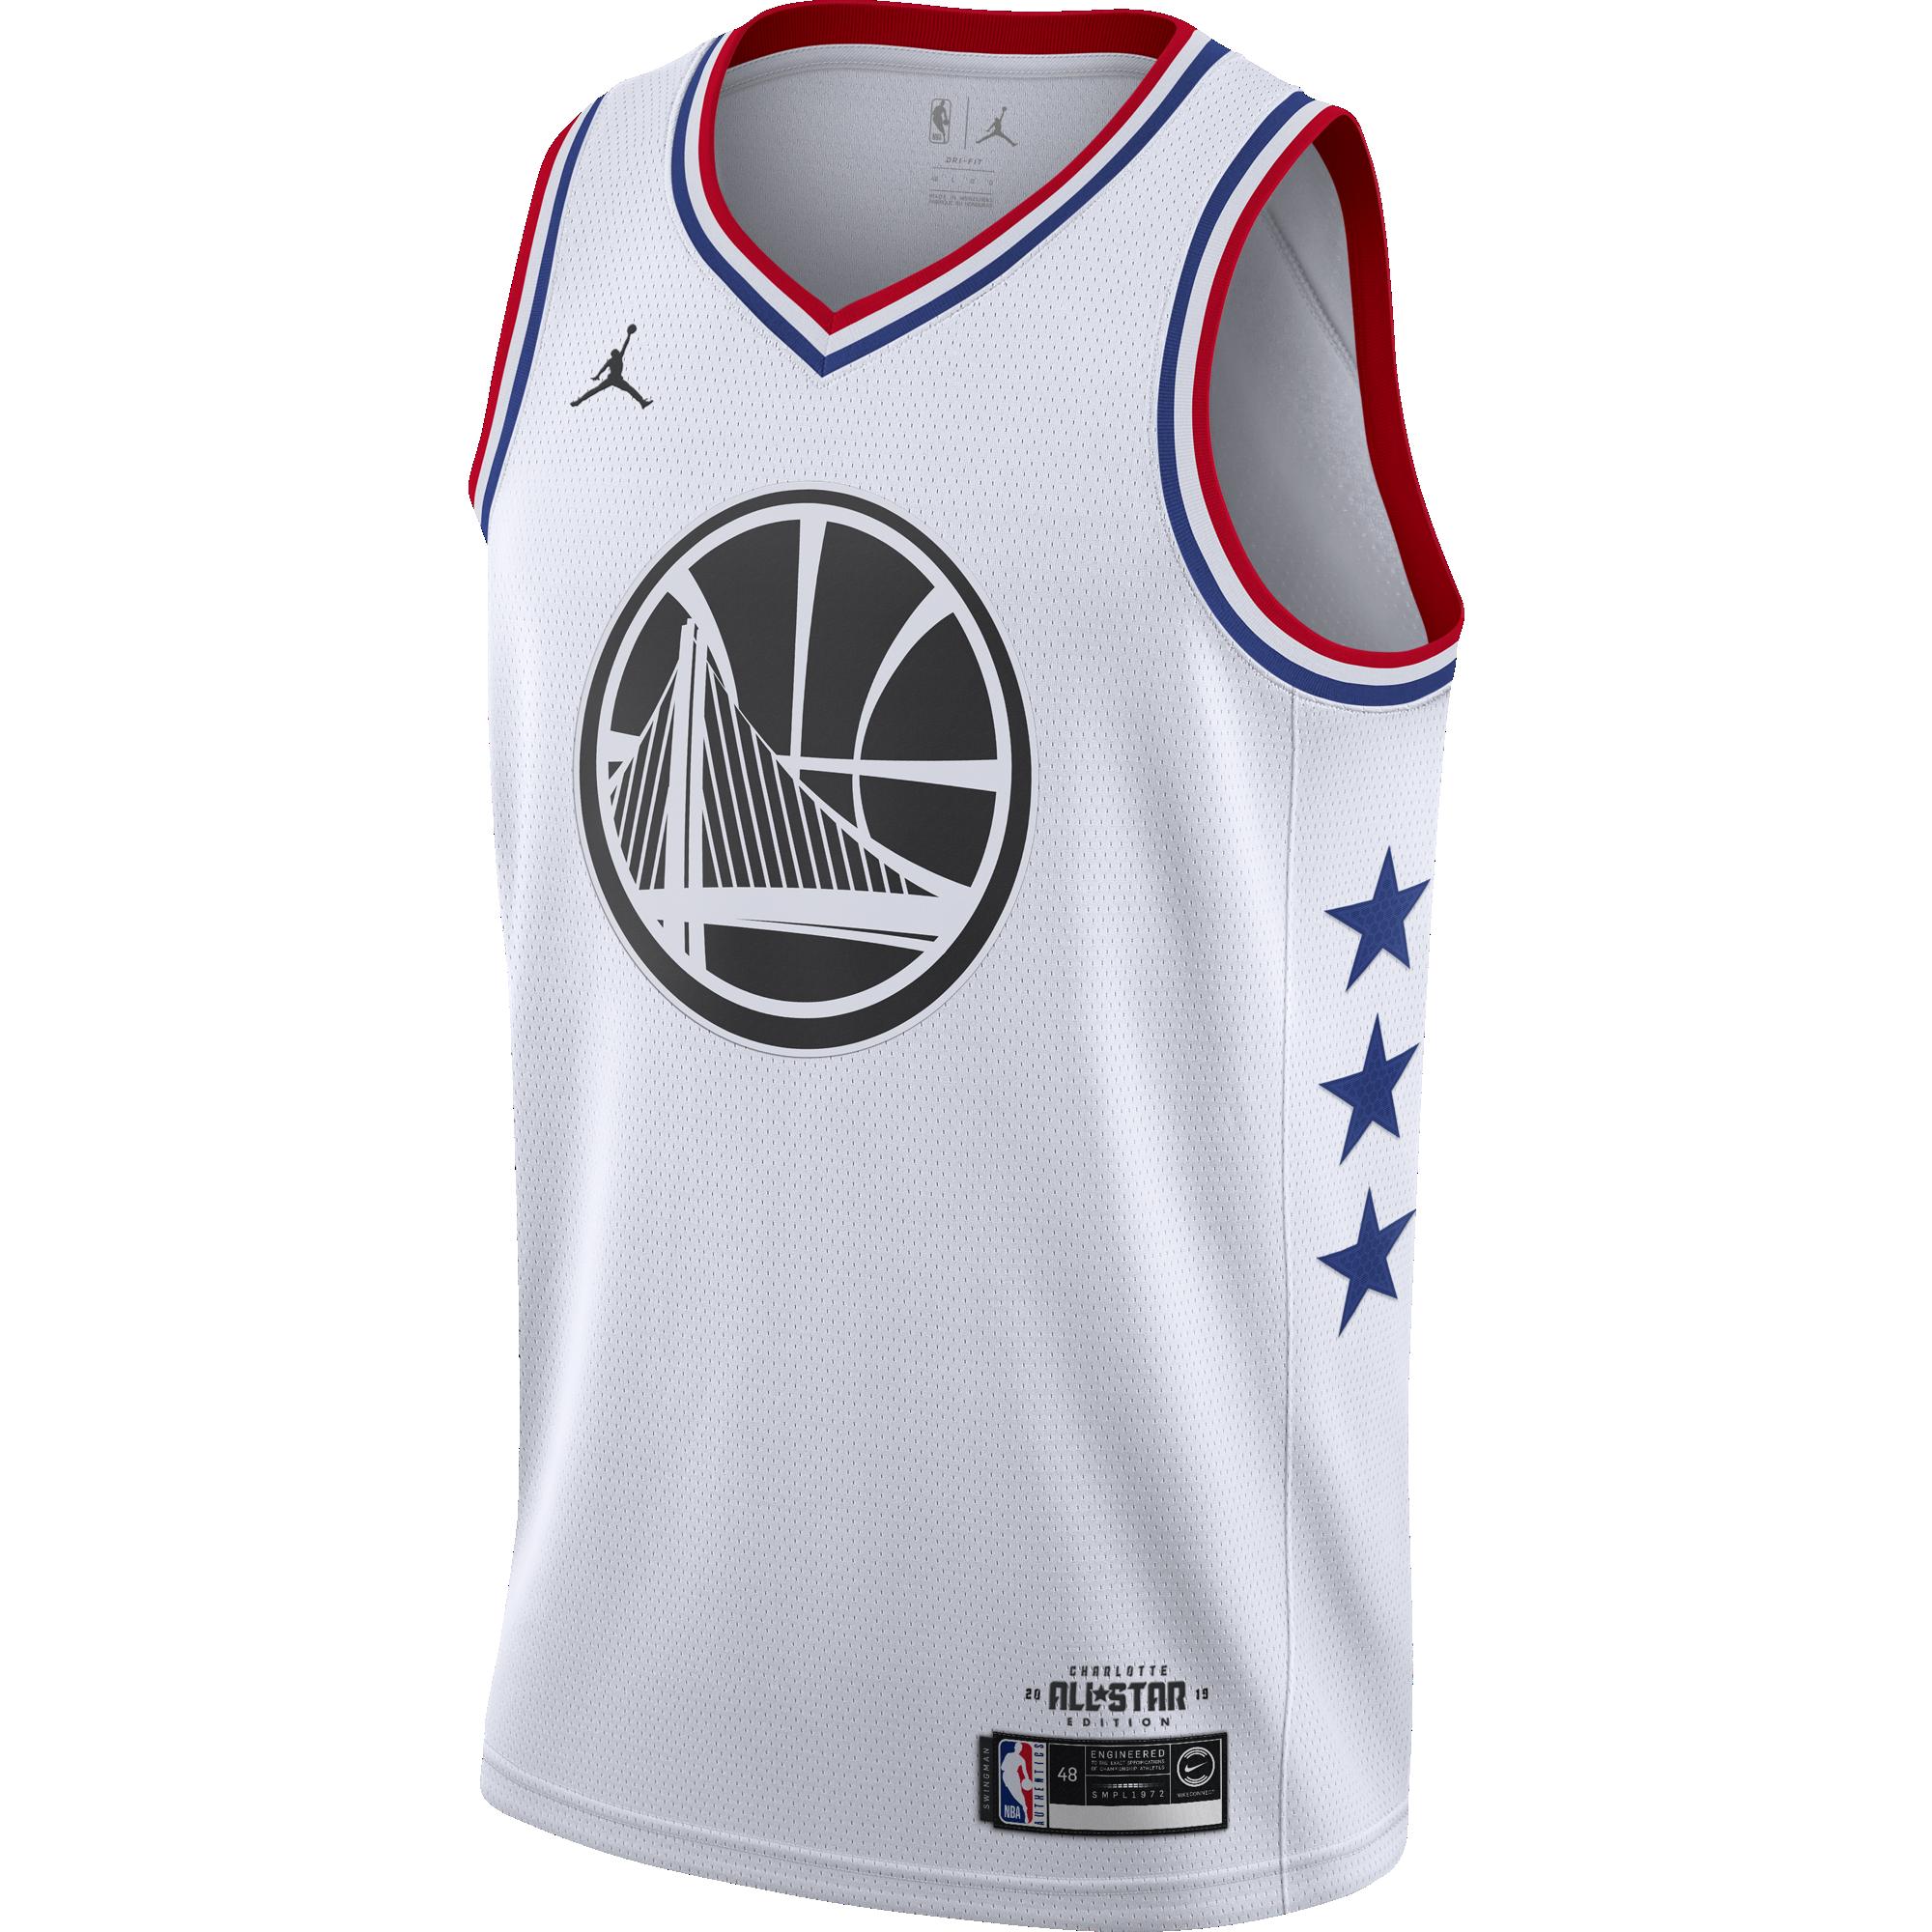 check out 3dc37 17394 AIR JORDAN NBA ALL STAR WEEKEND 2019 STEPHEN CURRY SWINGMAN ...